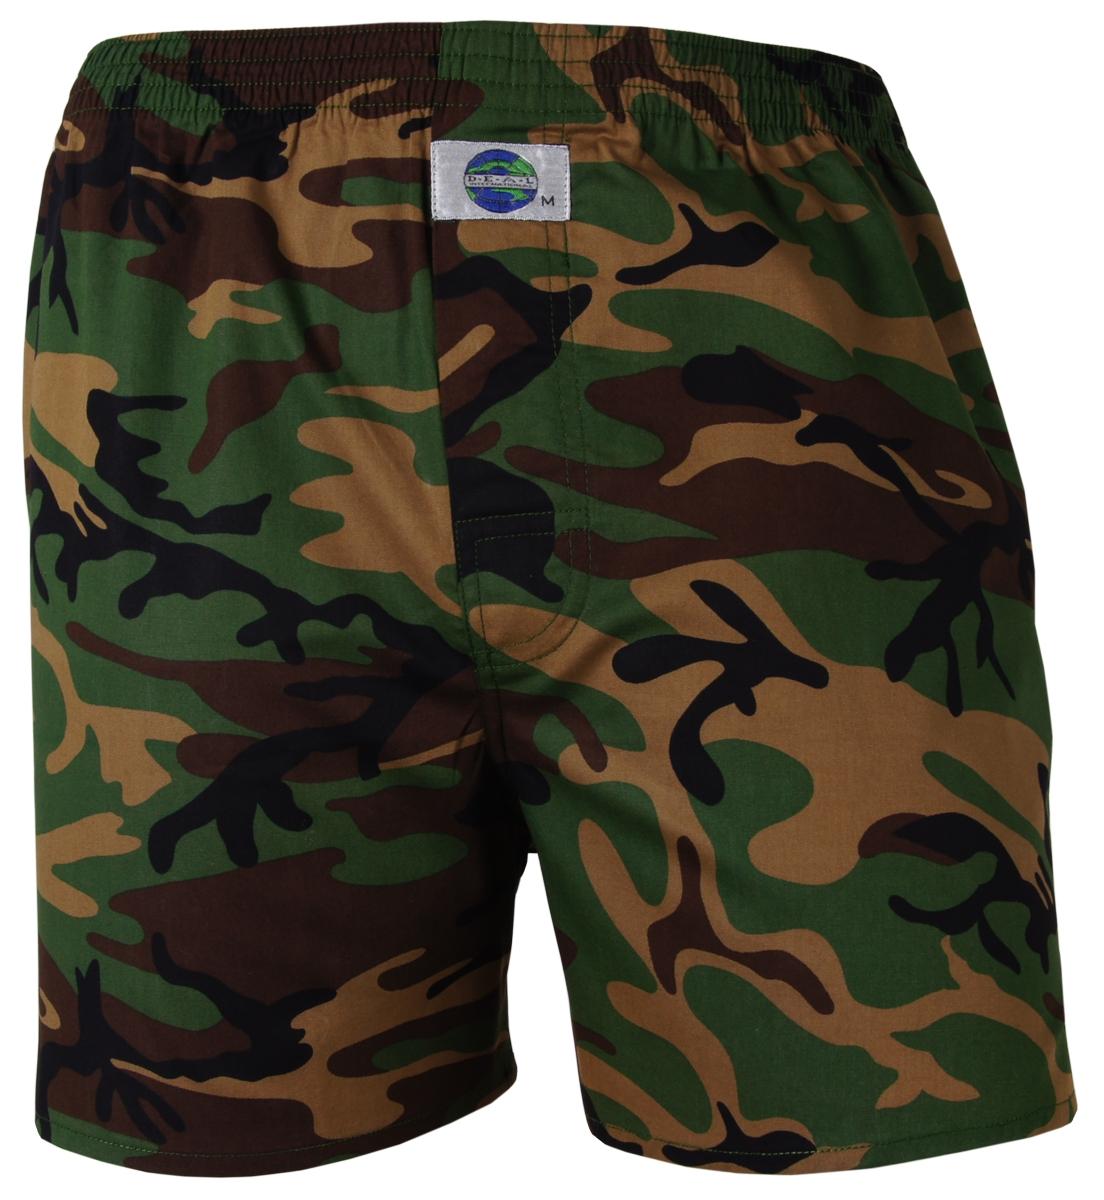 deal international boxer shorts camouflage of 100 cotton. Black Bedroom Furniture Sets. Home Design Ideas